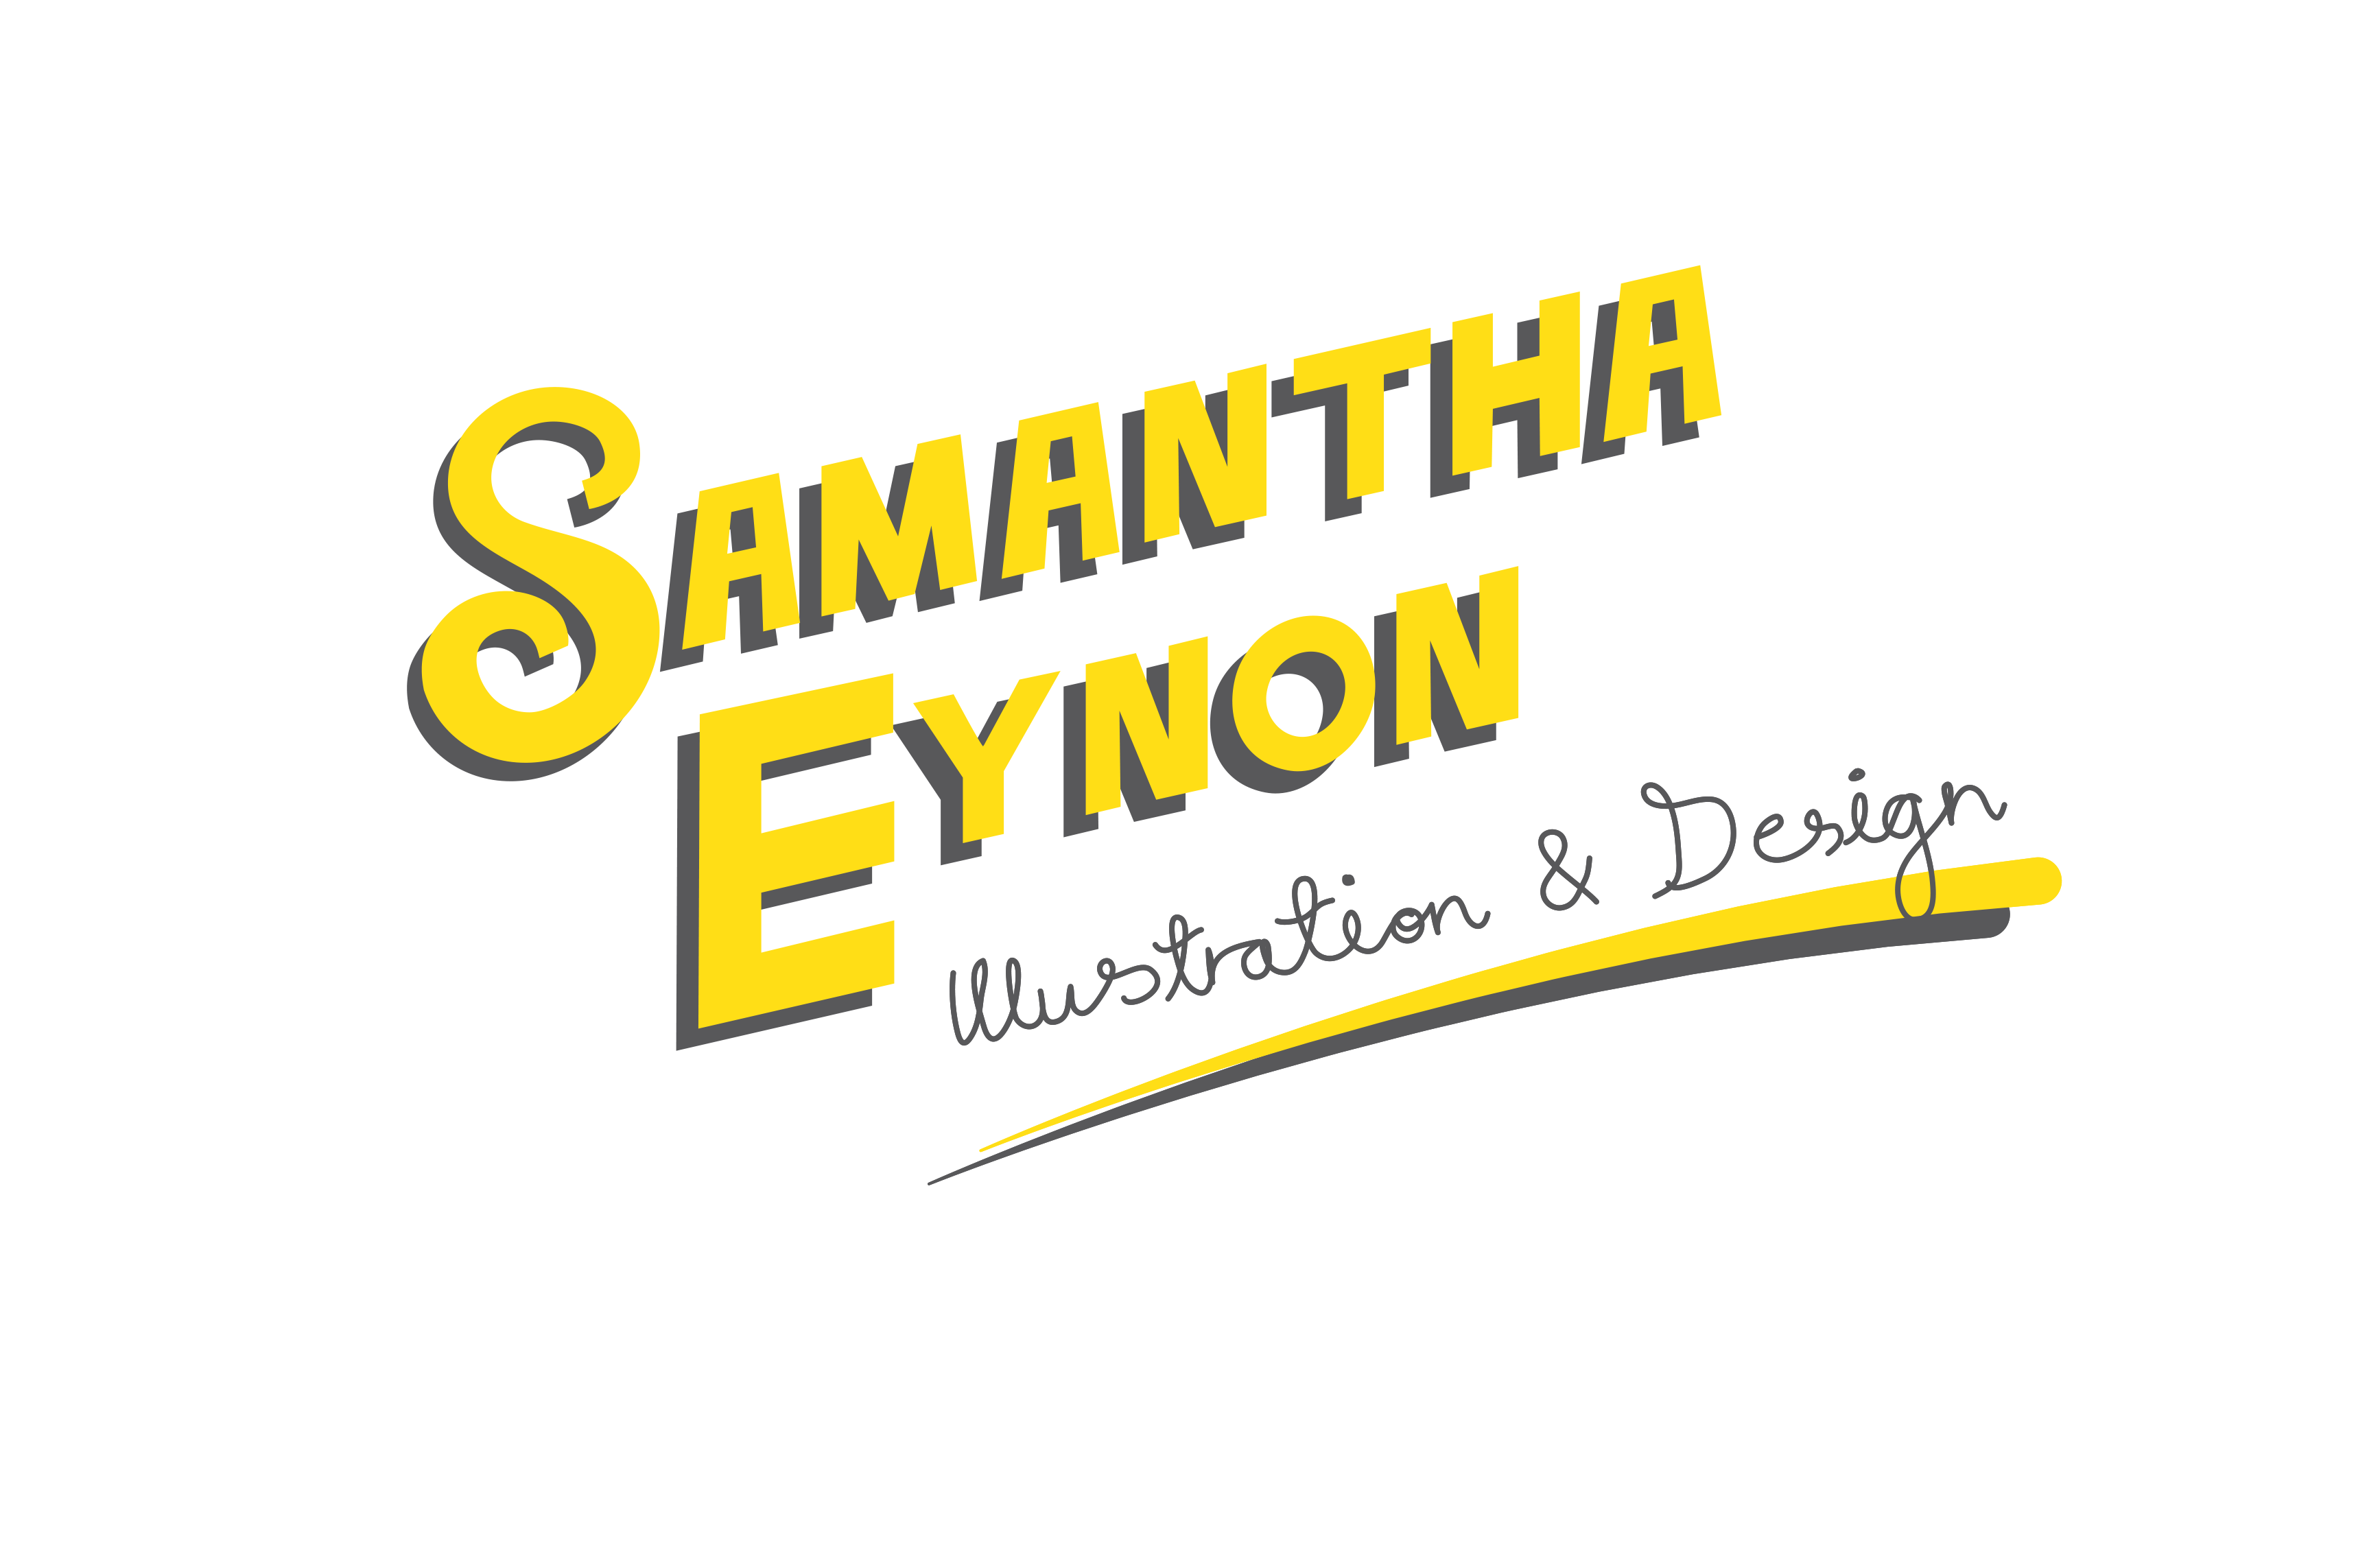 samanthaeynon